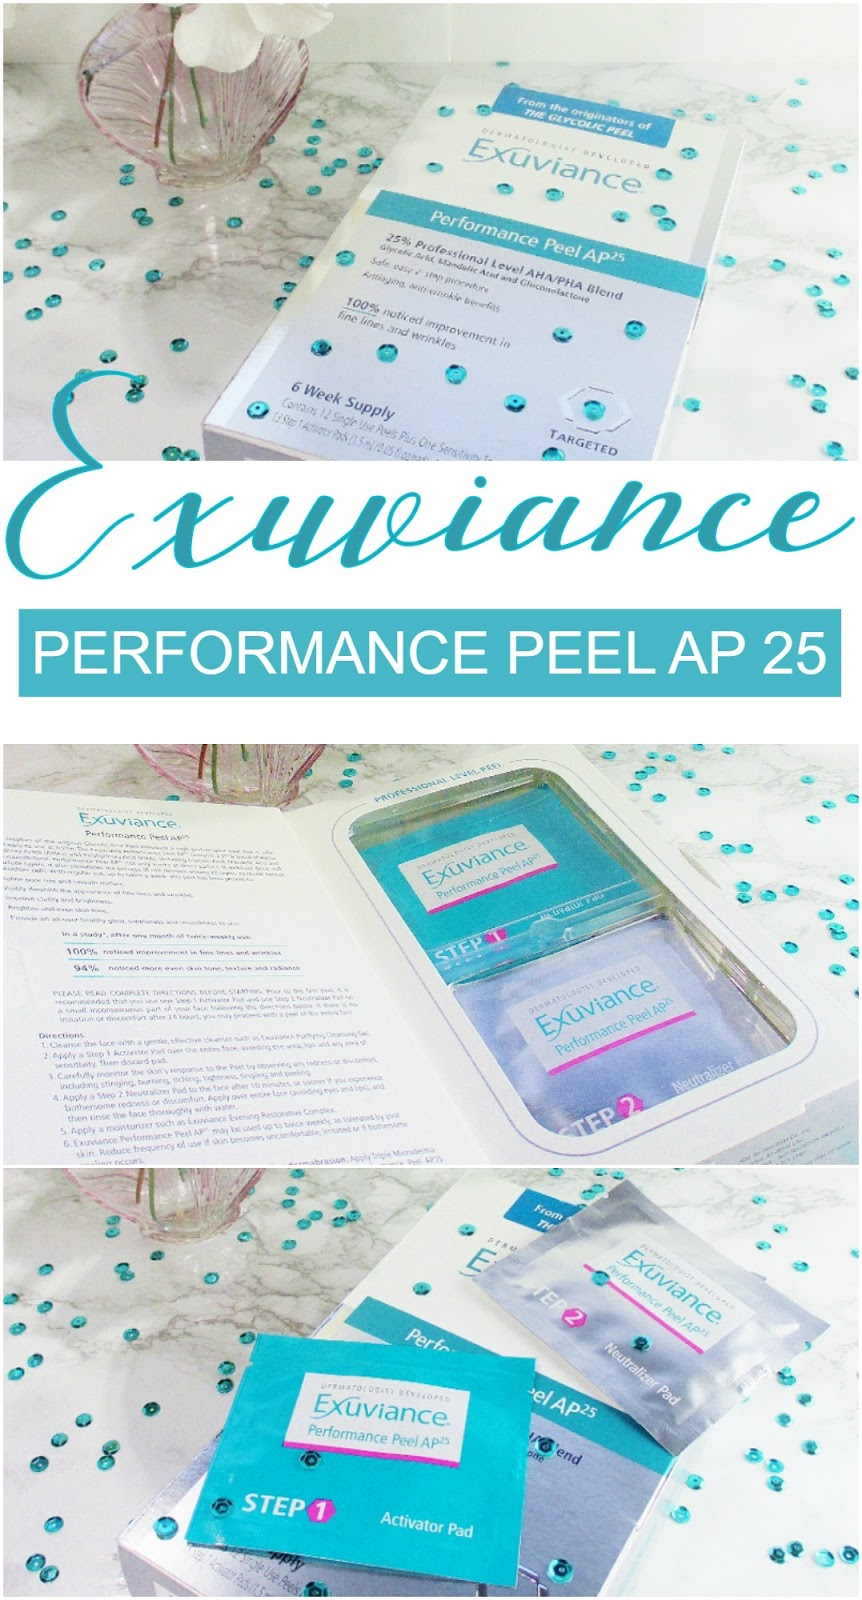 exuviance-perfornamce-peel-ap-25-